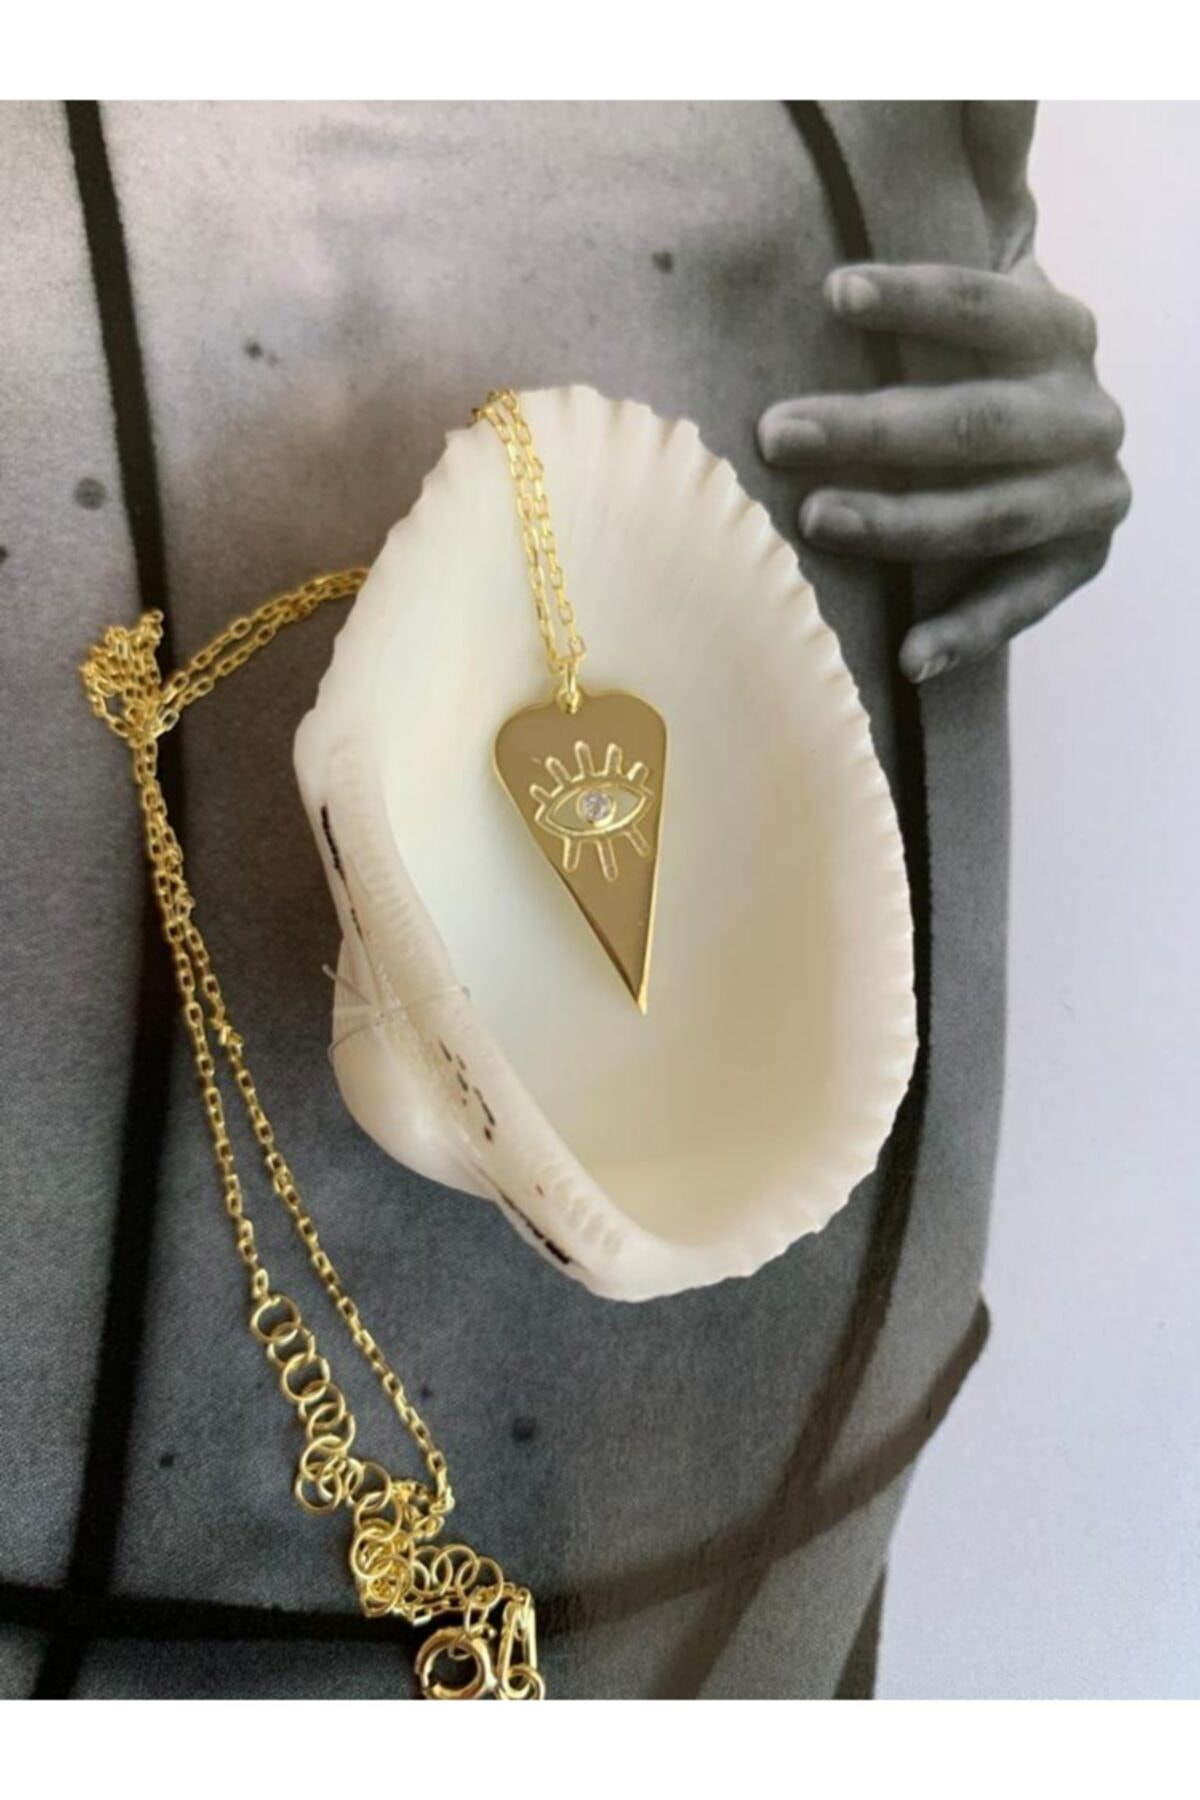 bvjewel 925 Ayar Gümüş Üçgen Taşlı Göz Kolye